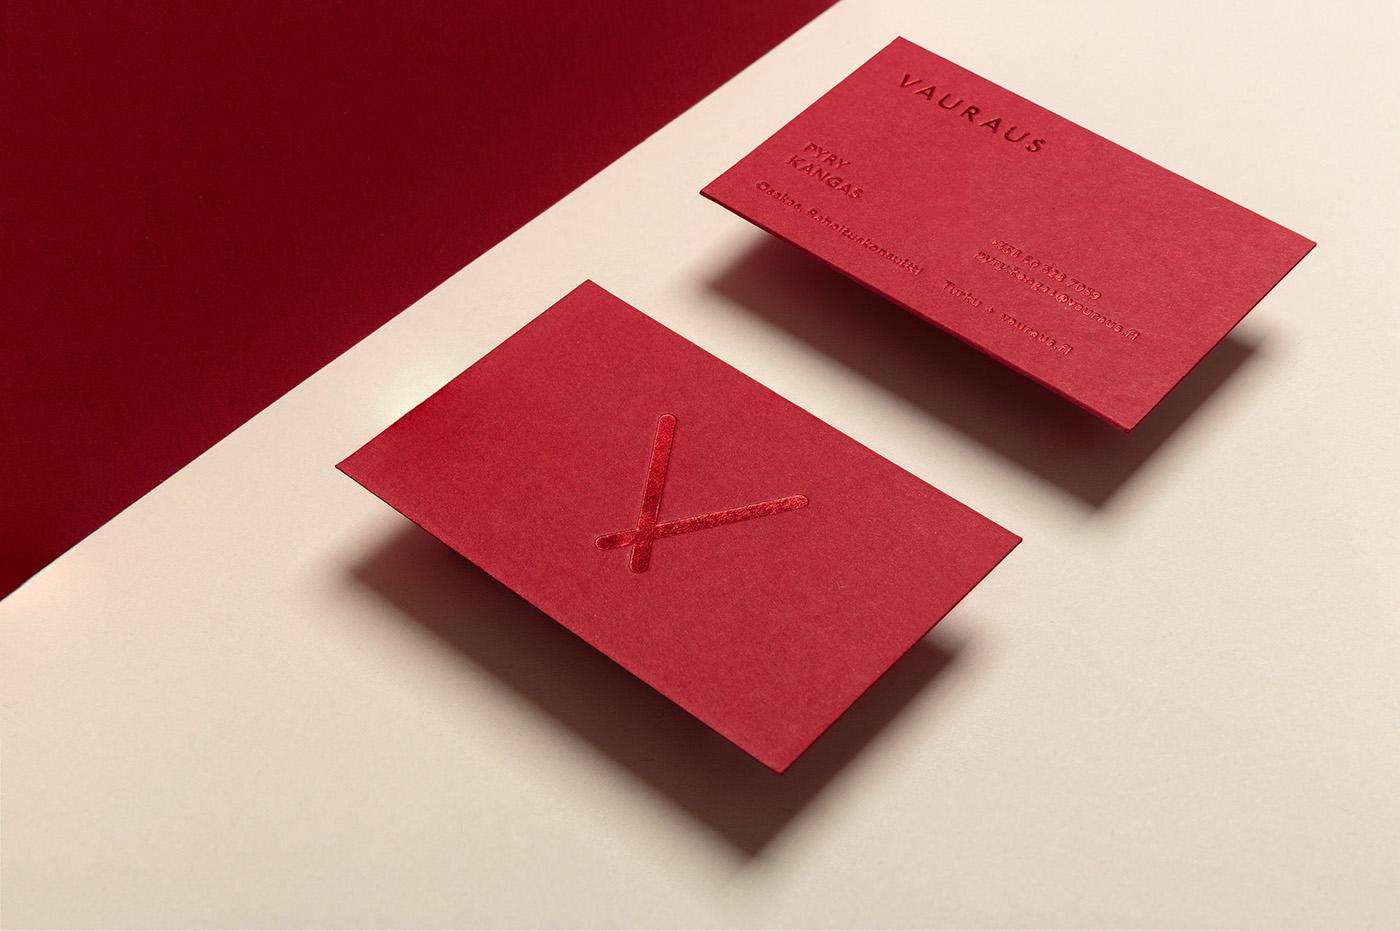 helsinki Investment banking visual identity stationary business card